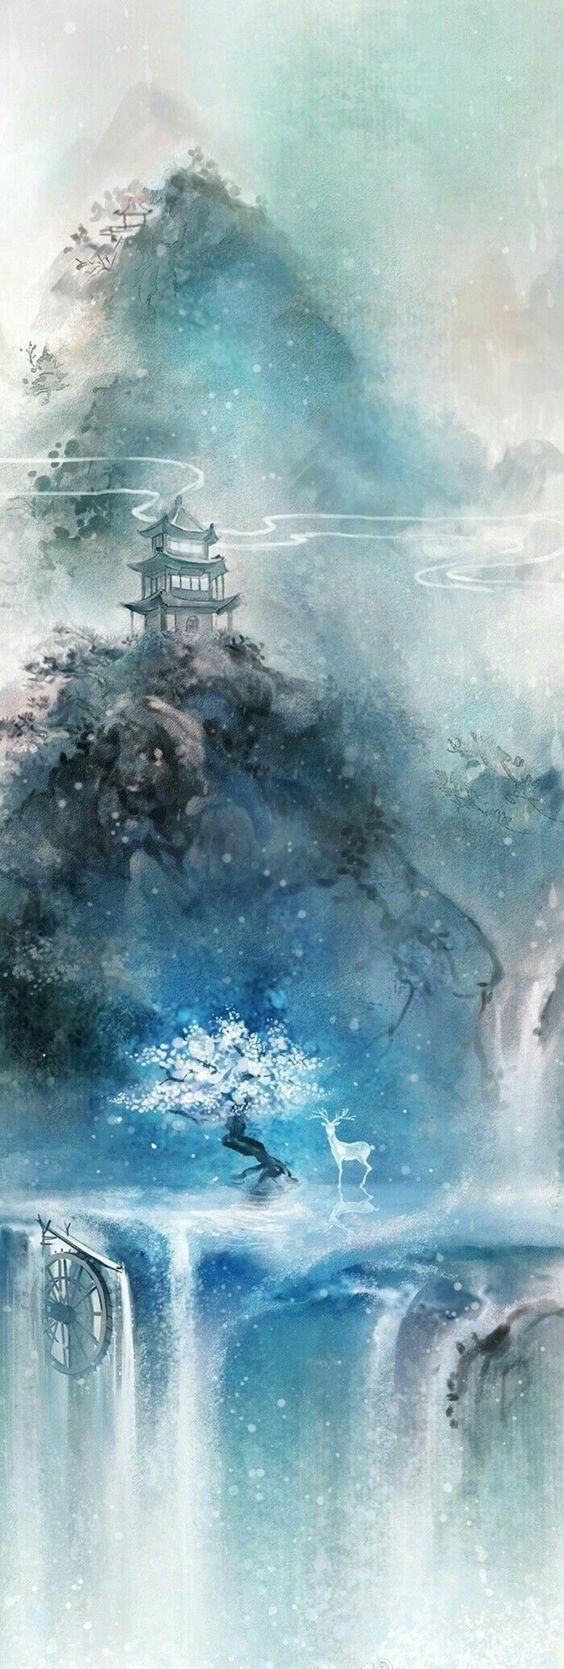 ARKA PLAN RESİMLERİ in 2020 Fantasy landscape, Landscape